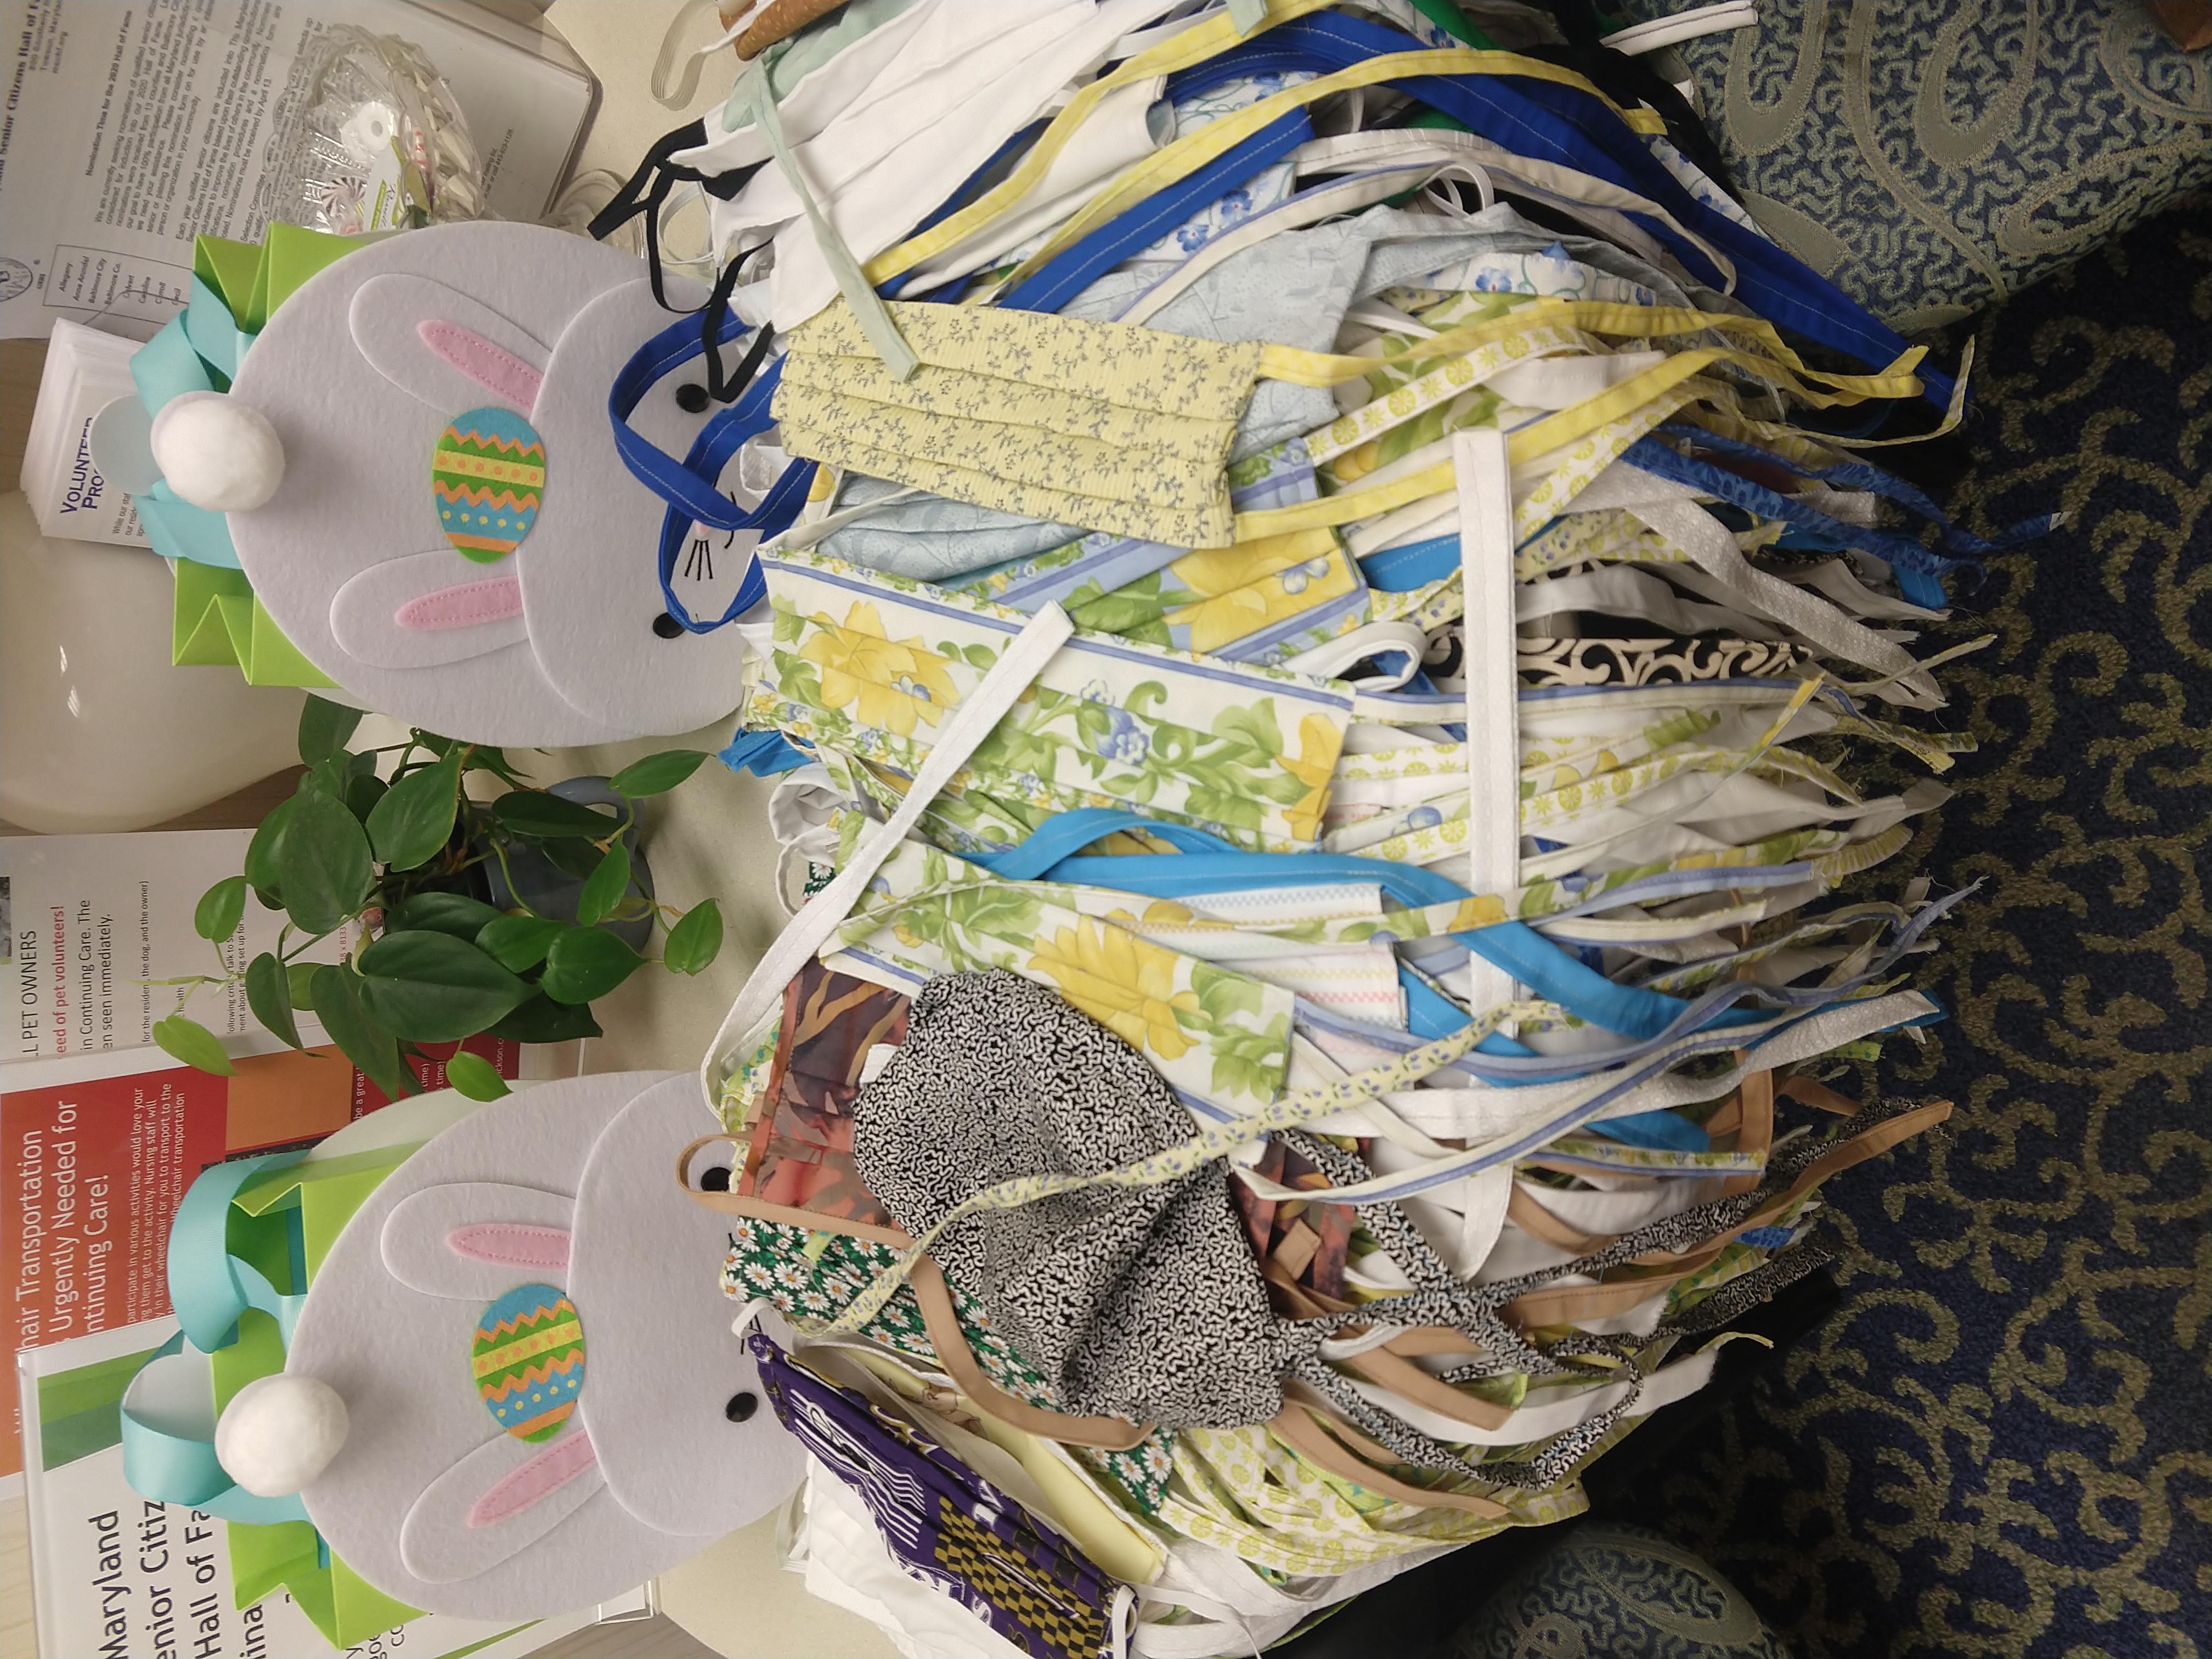 Charlestown volunteers sew more than 800 homemade face masks during coronavirus pandemic